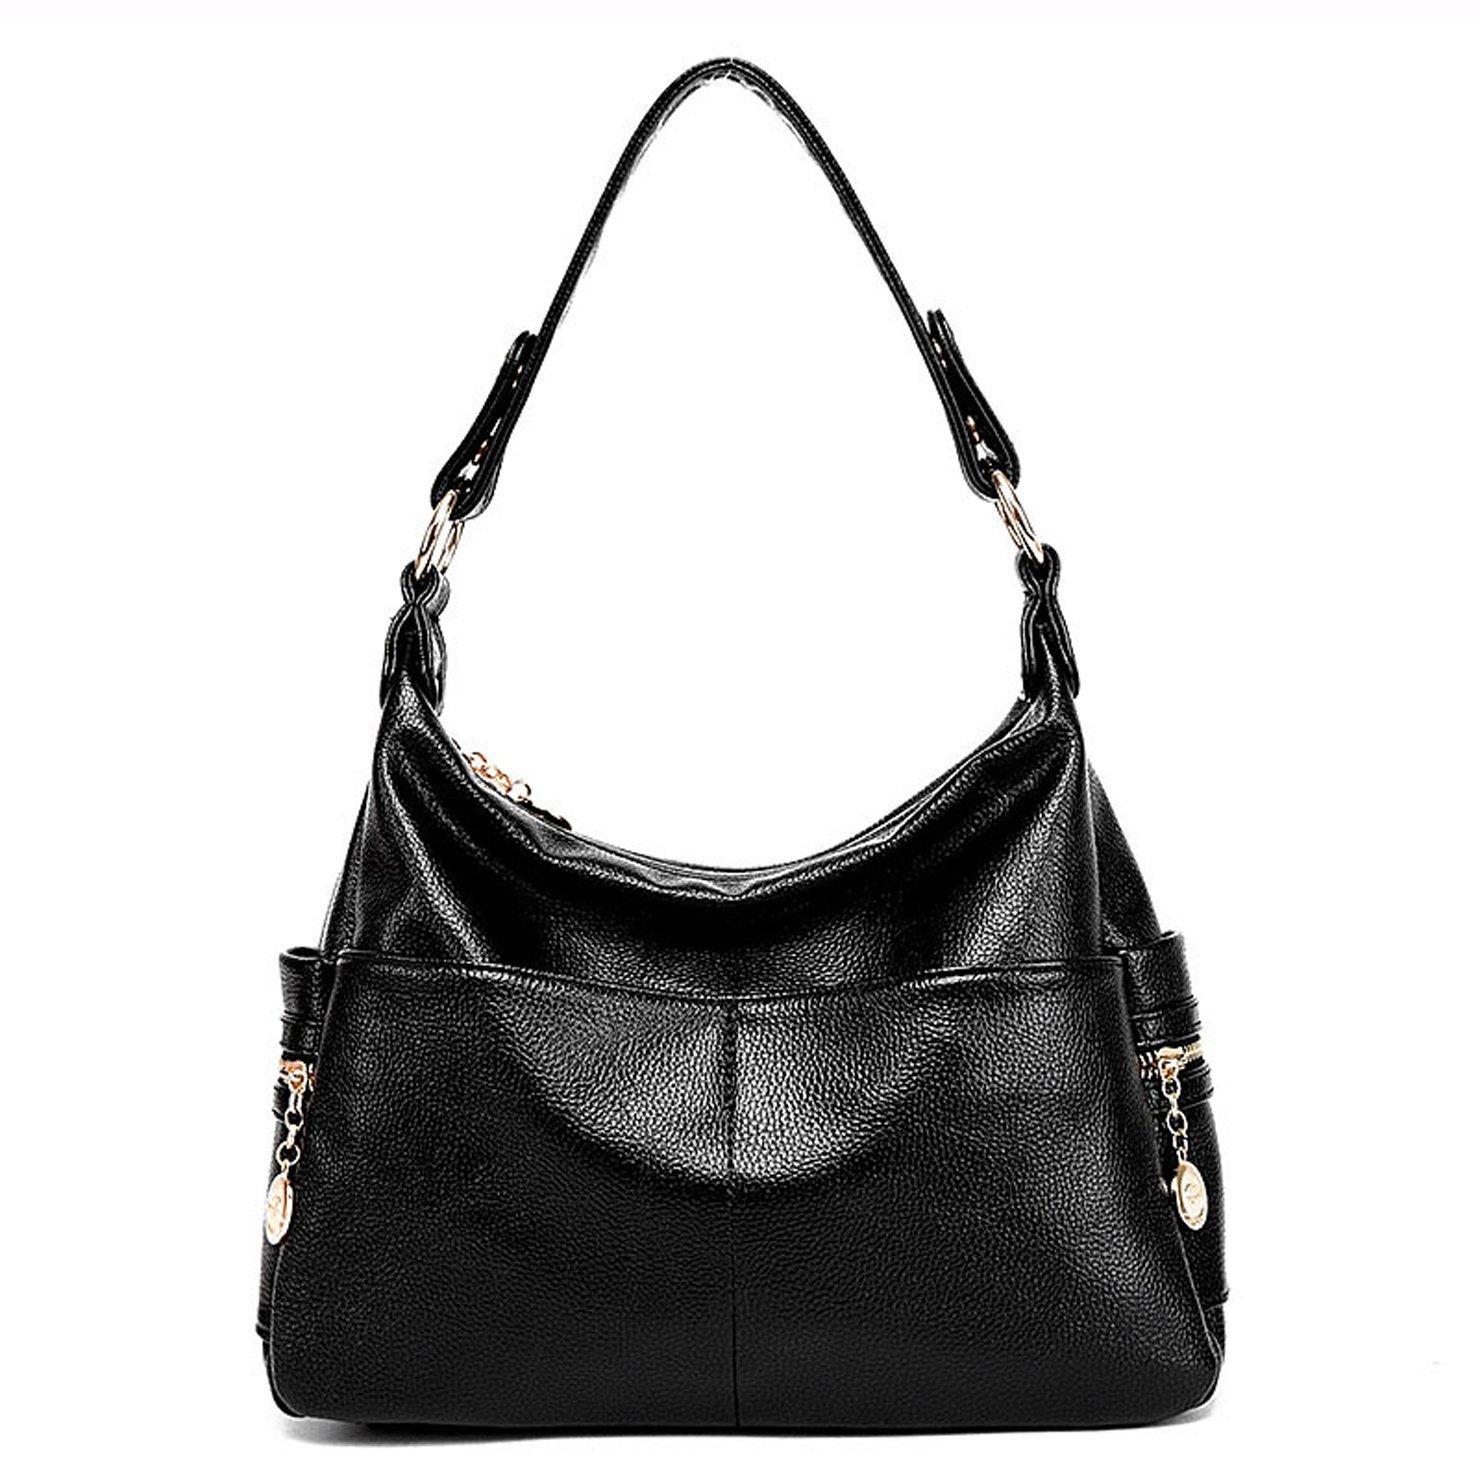 Lustear Leather Purse Shoulder Bag Hobo Style Handbags for Ladies (Black)